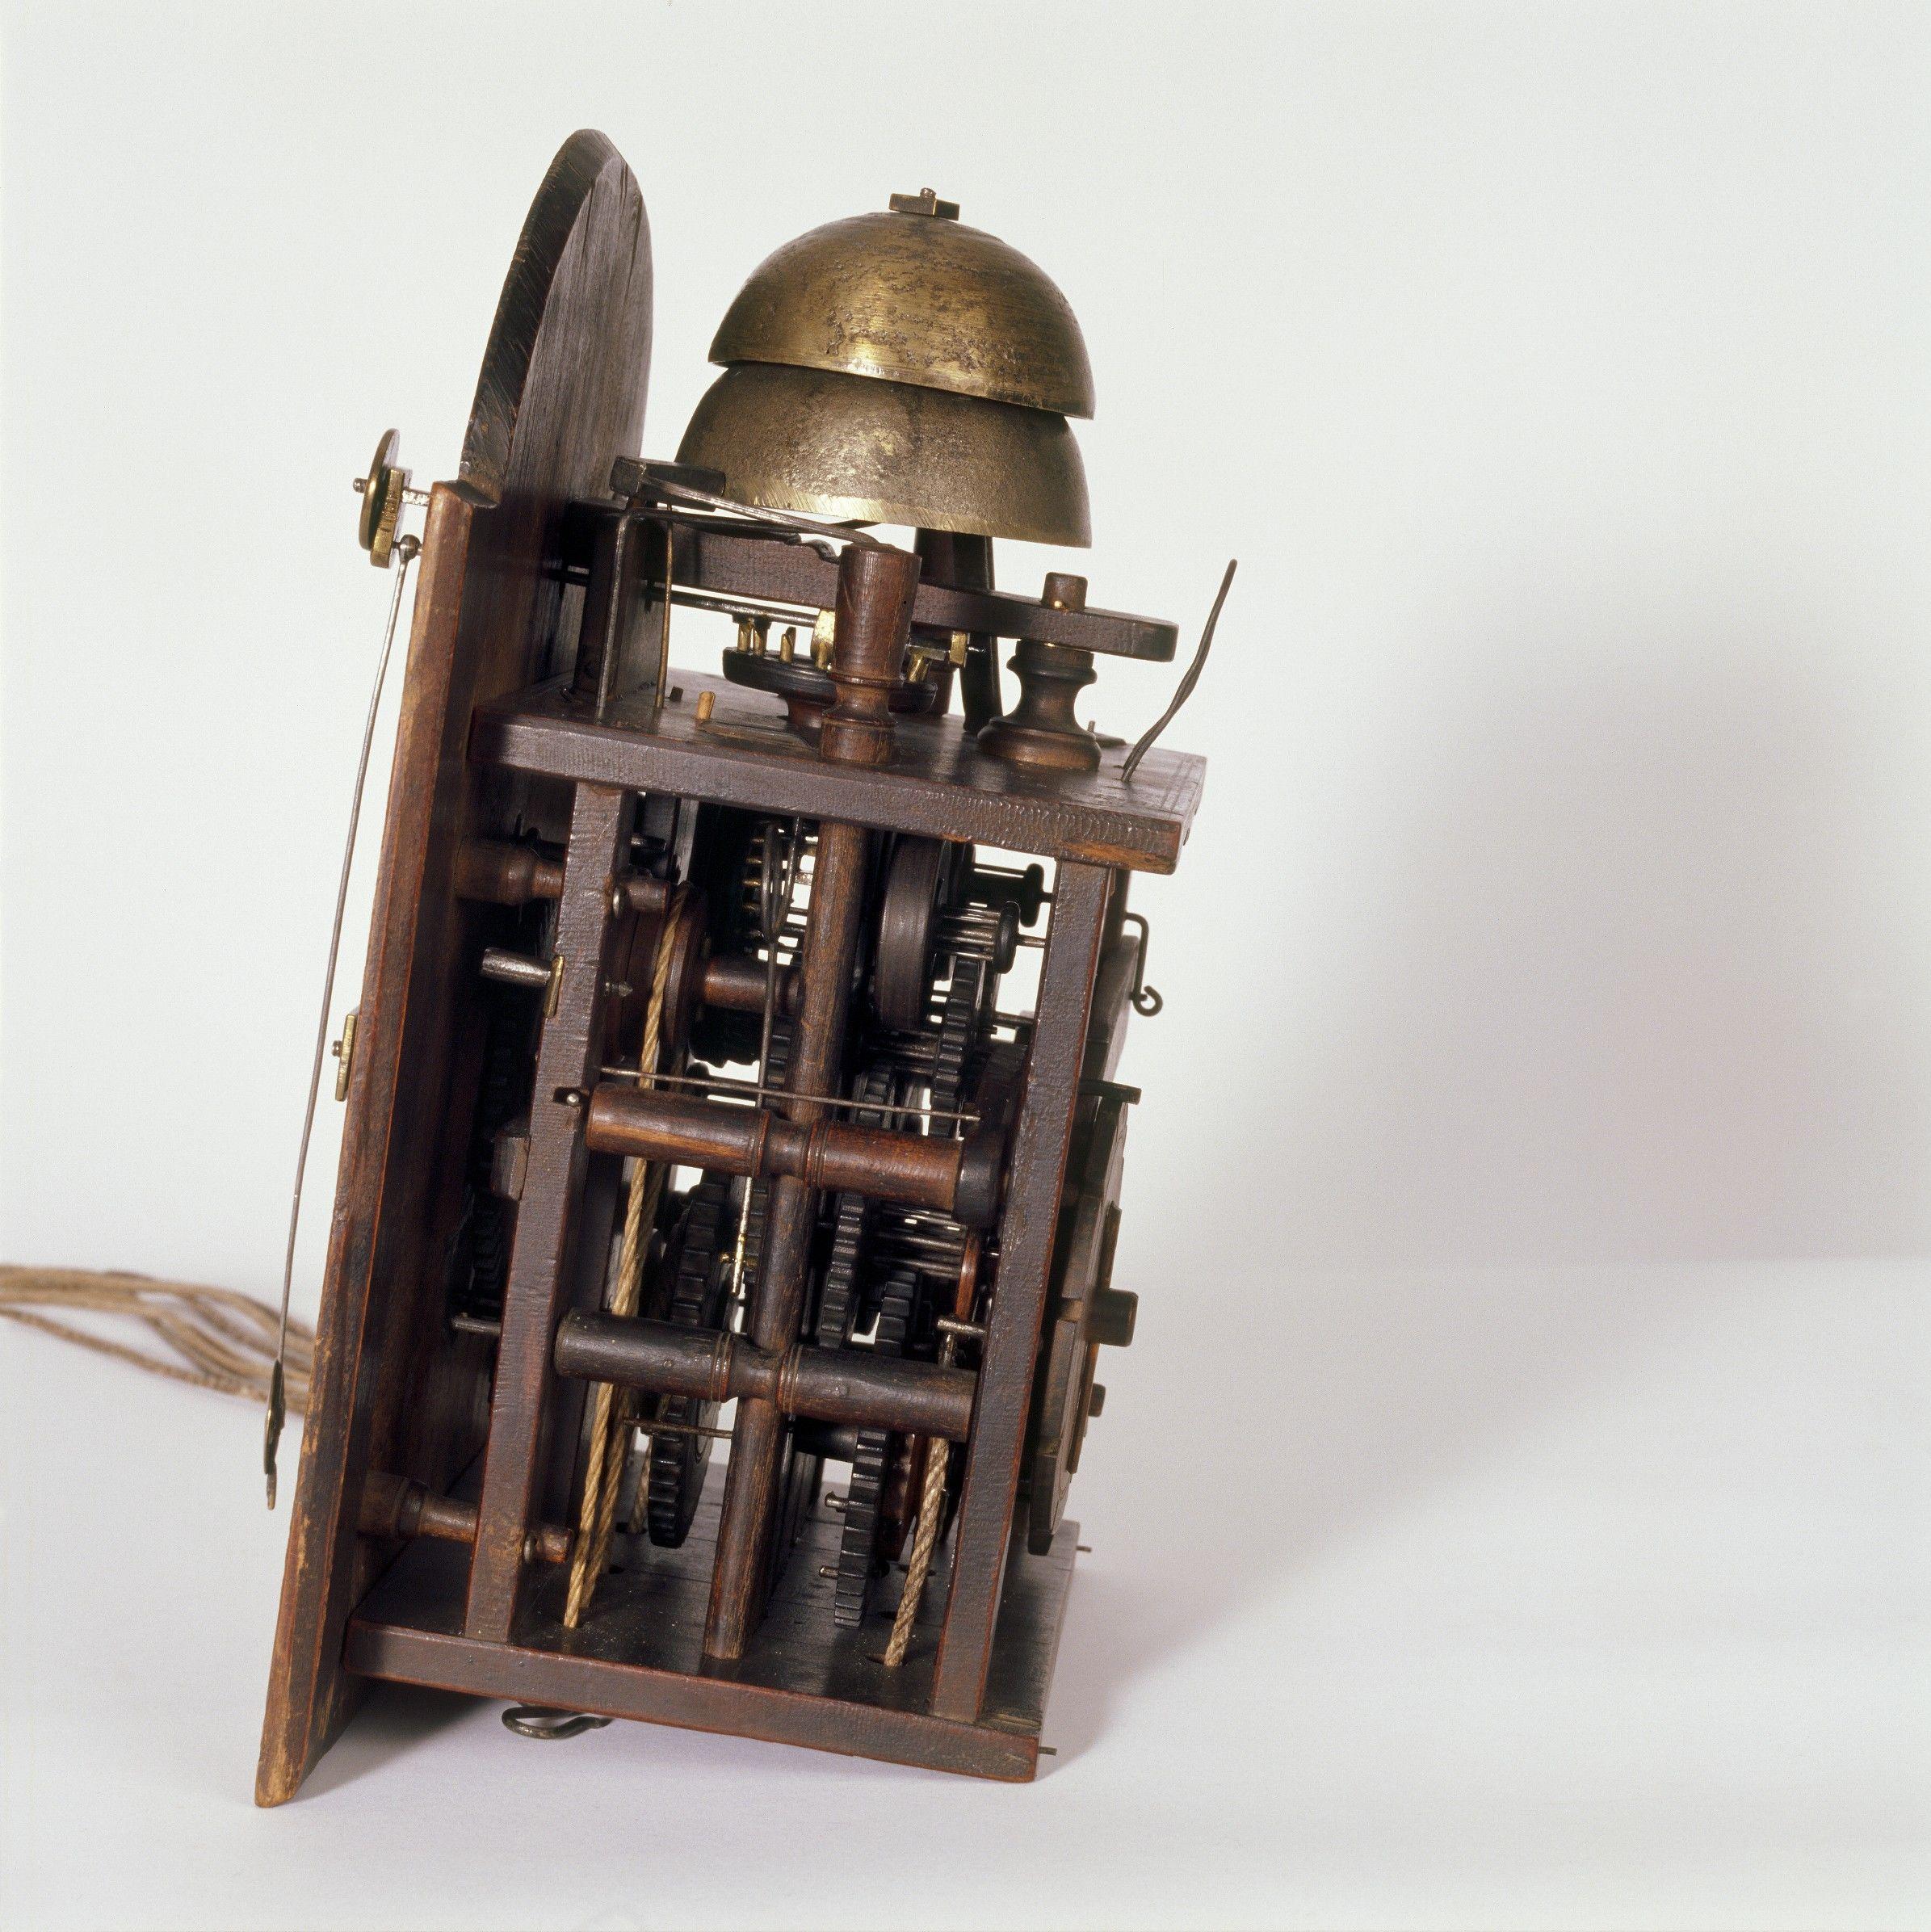 Museum am Mittag: Holzräderuhren aus dem Salzkammergut